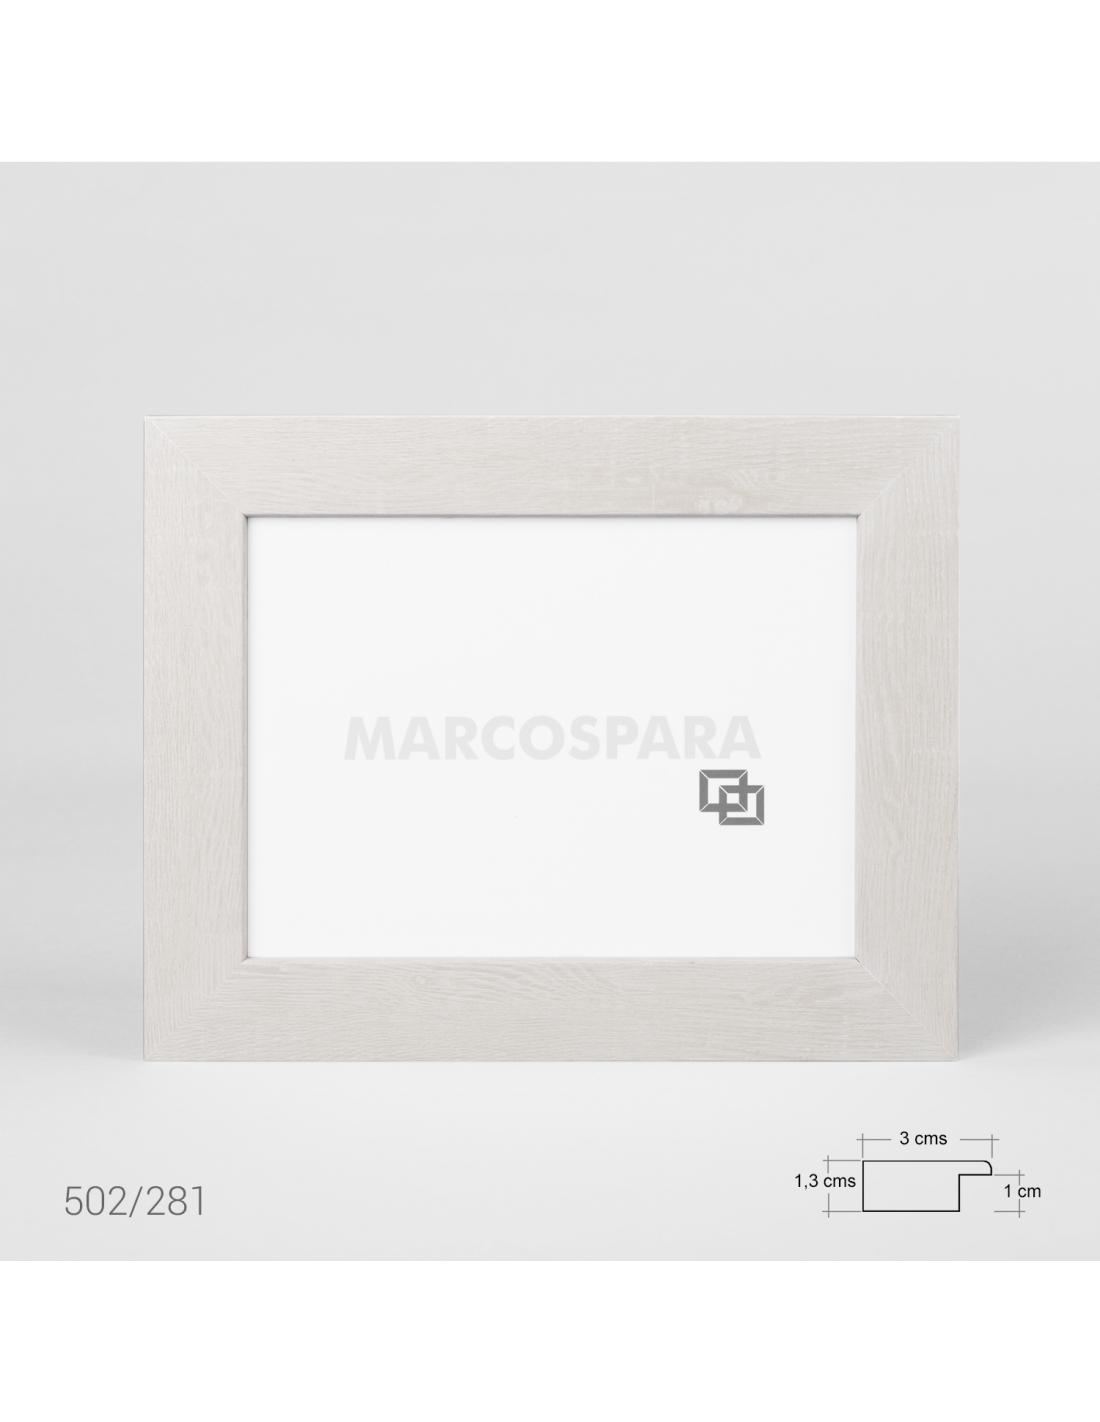 Marcos de madera para Puzzles M502